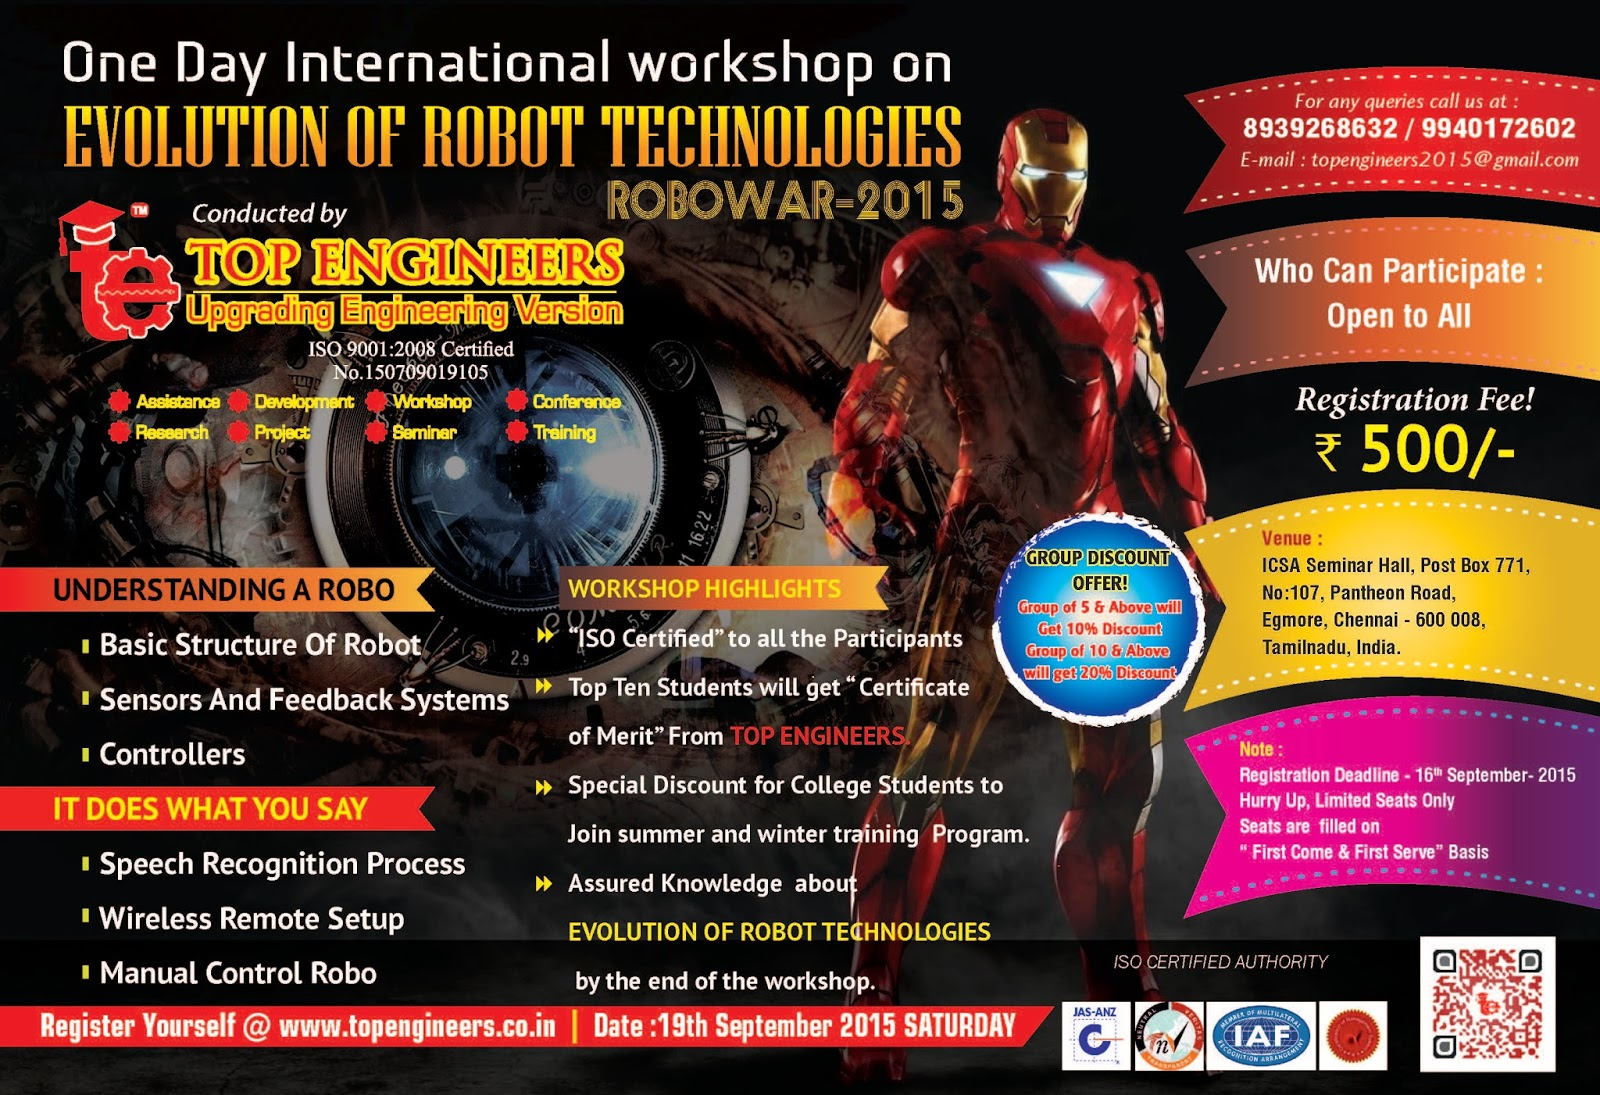 International Workshop on Evolution of Robot Technologies - Robowar 2015